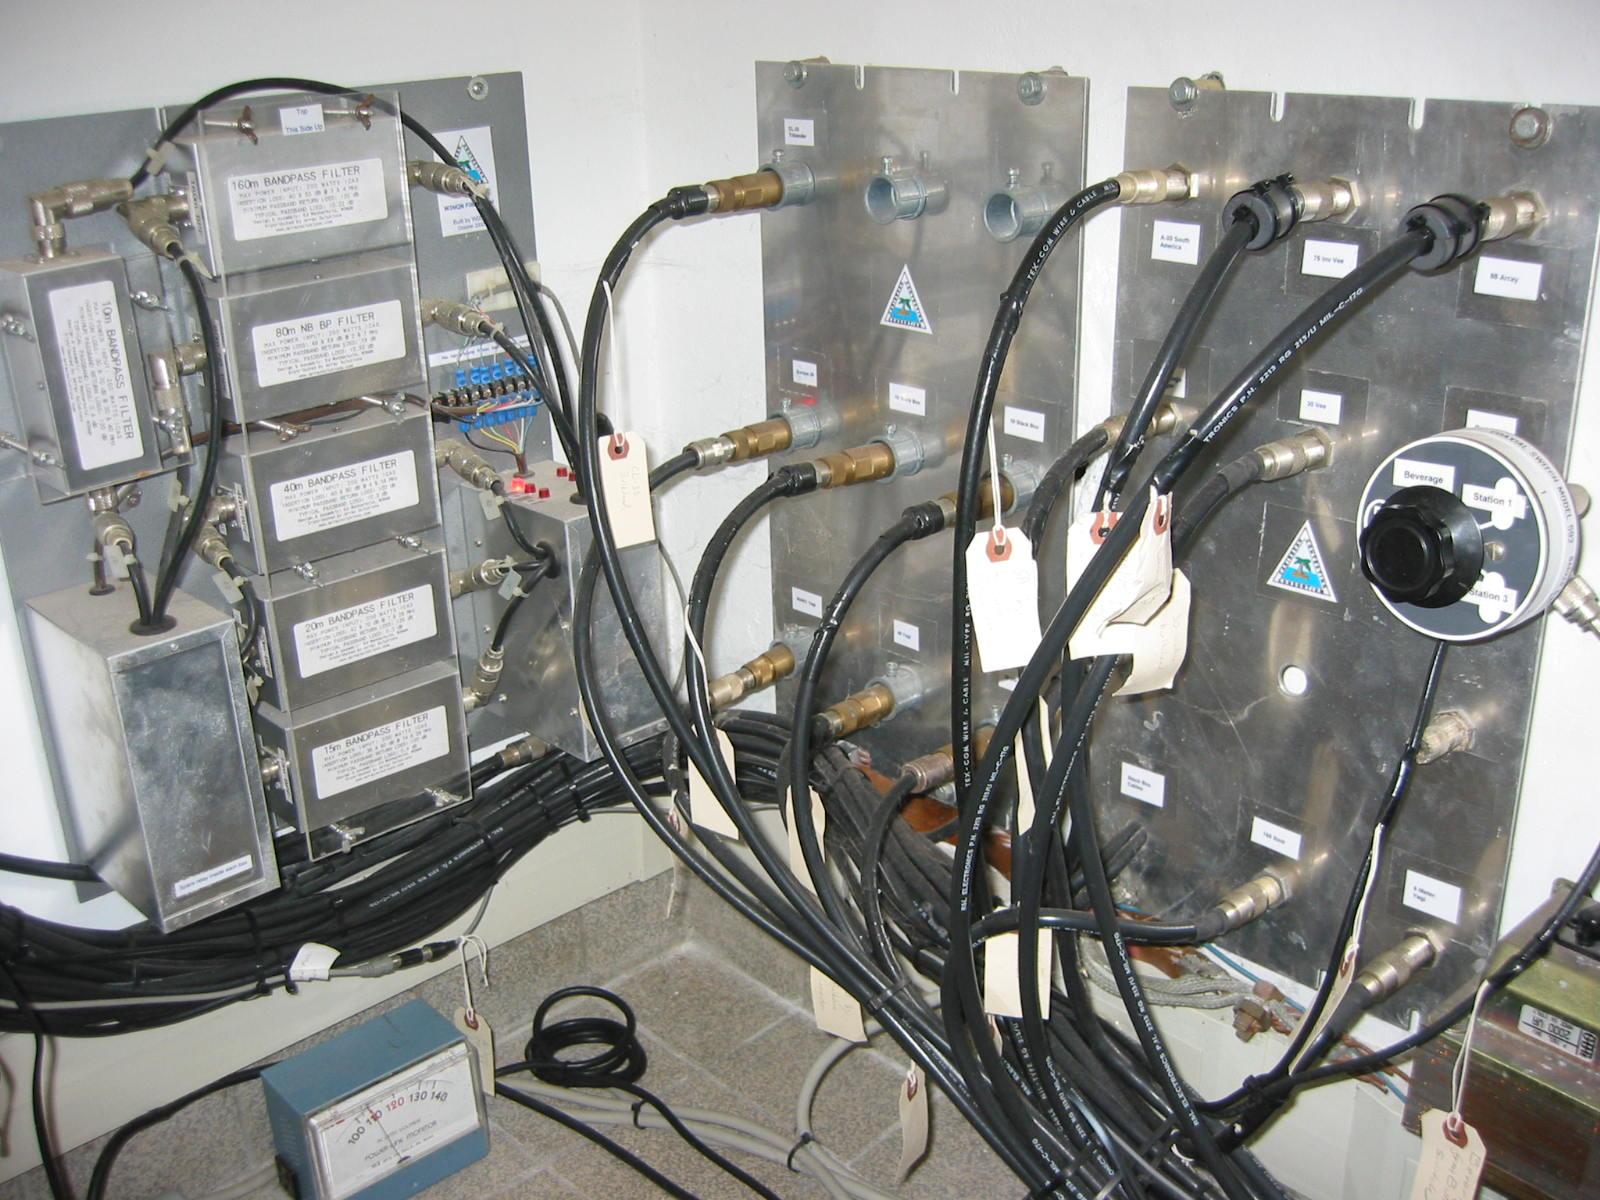 Pj2t Station Home Page Telephone Rewiring Adsl Quotpro Installquot Entry Bulkhead